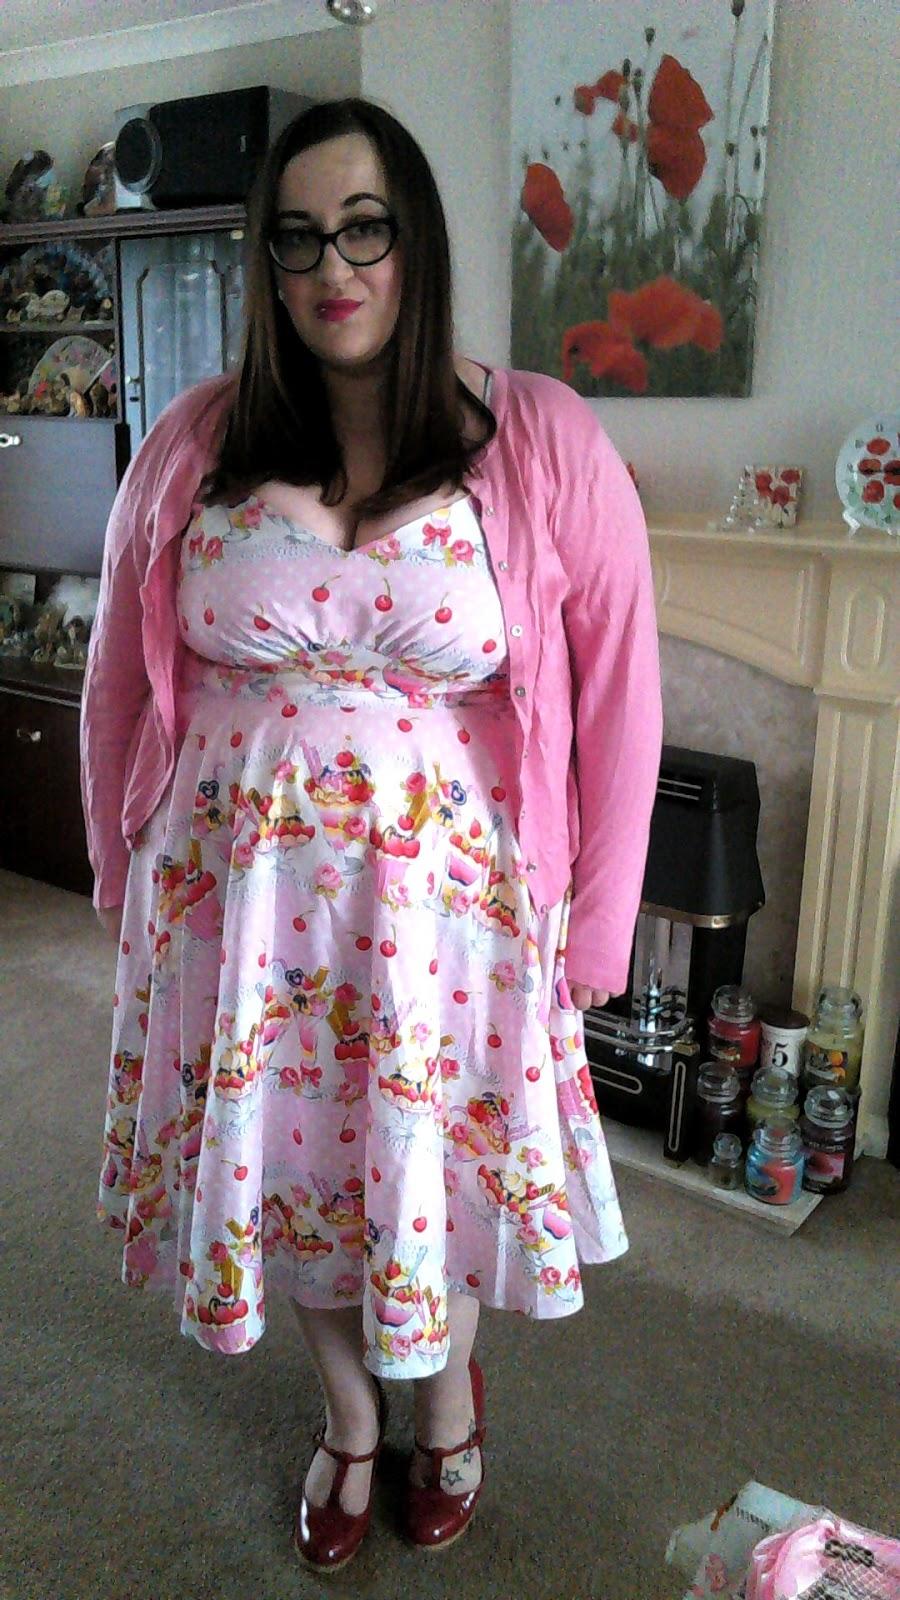 fat plus size girl bbw (size 20/22) wearing a polka dot polly sundae dress